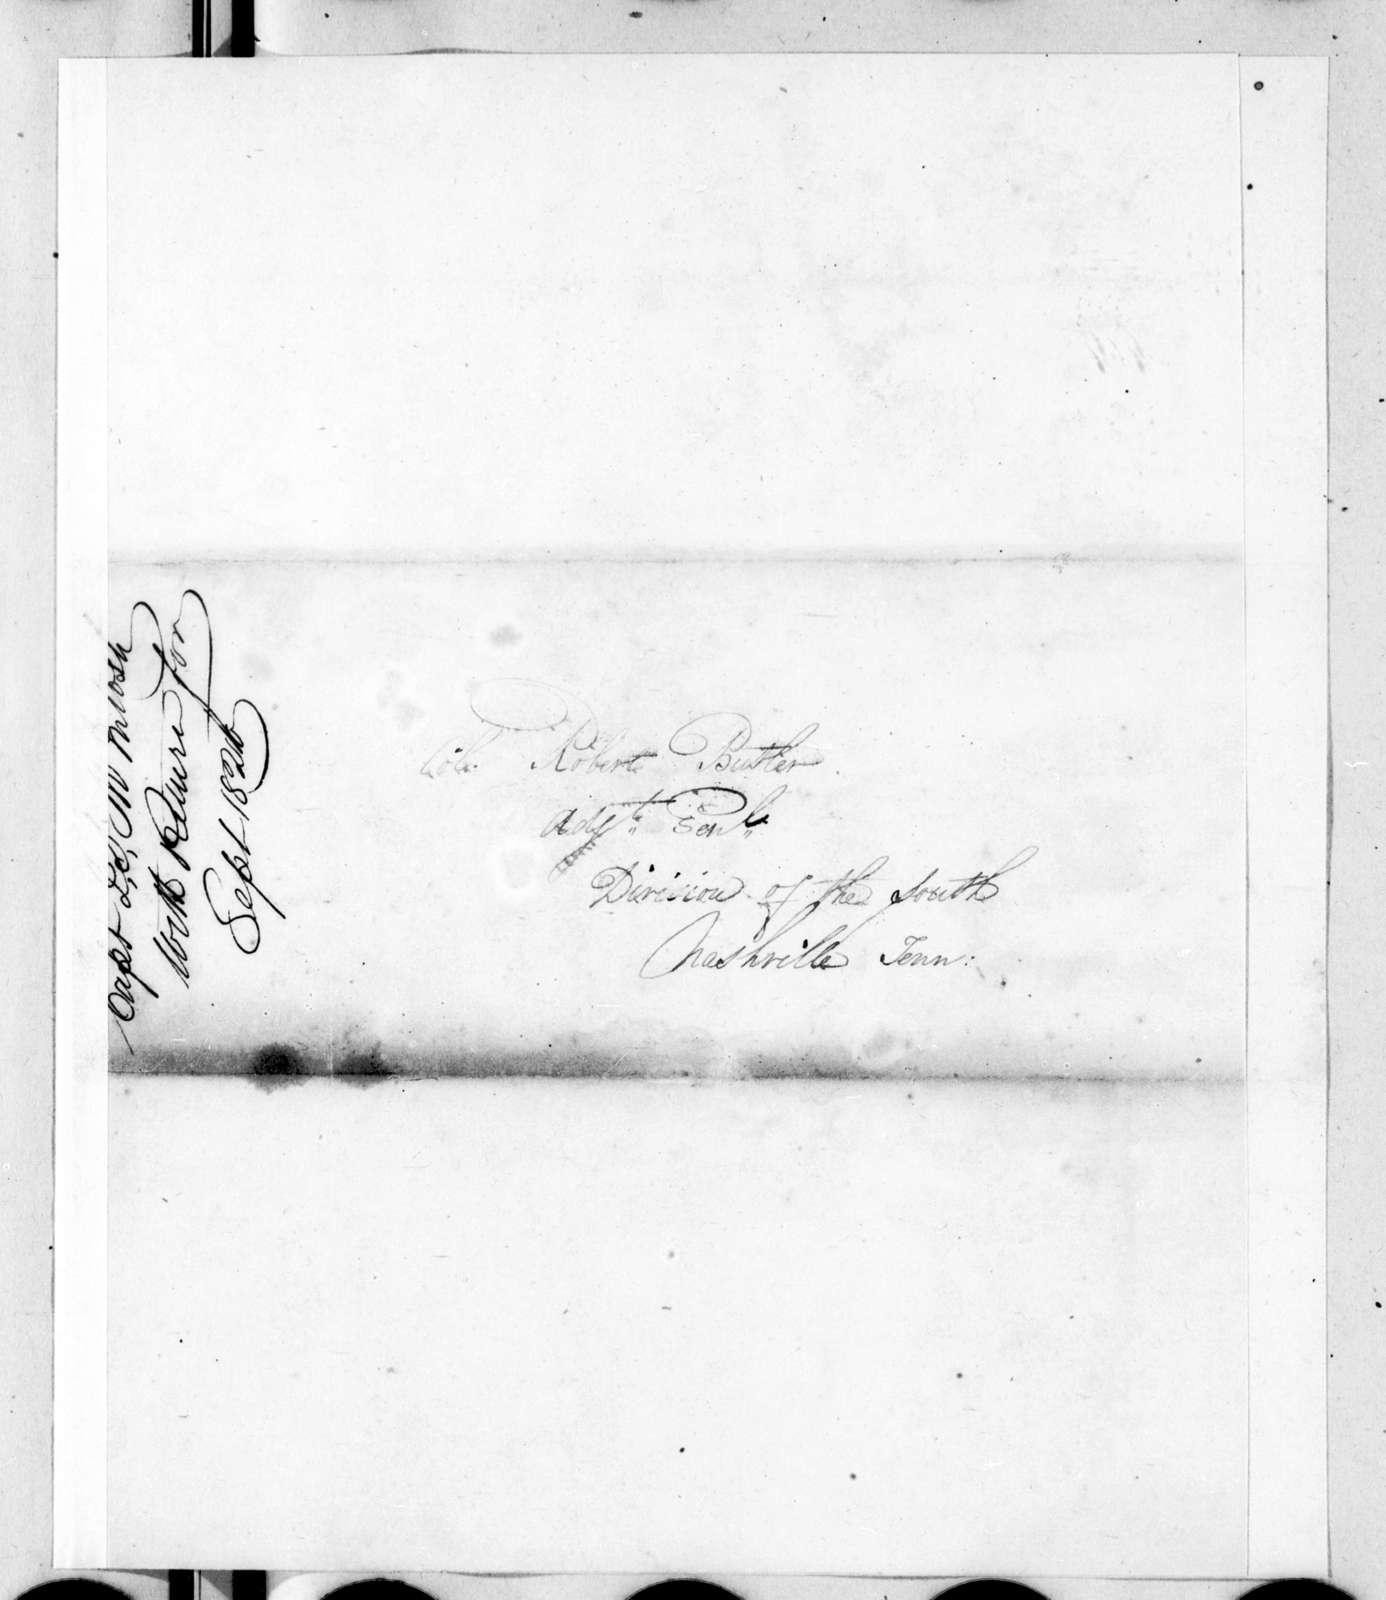 J. S. McIntosh to Robert Butler, October 4, 1820